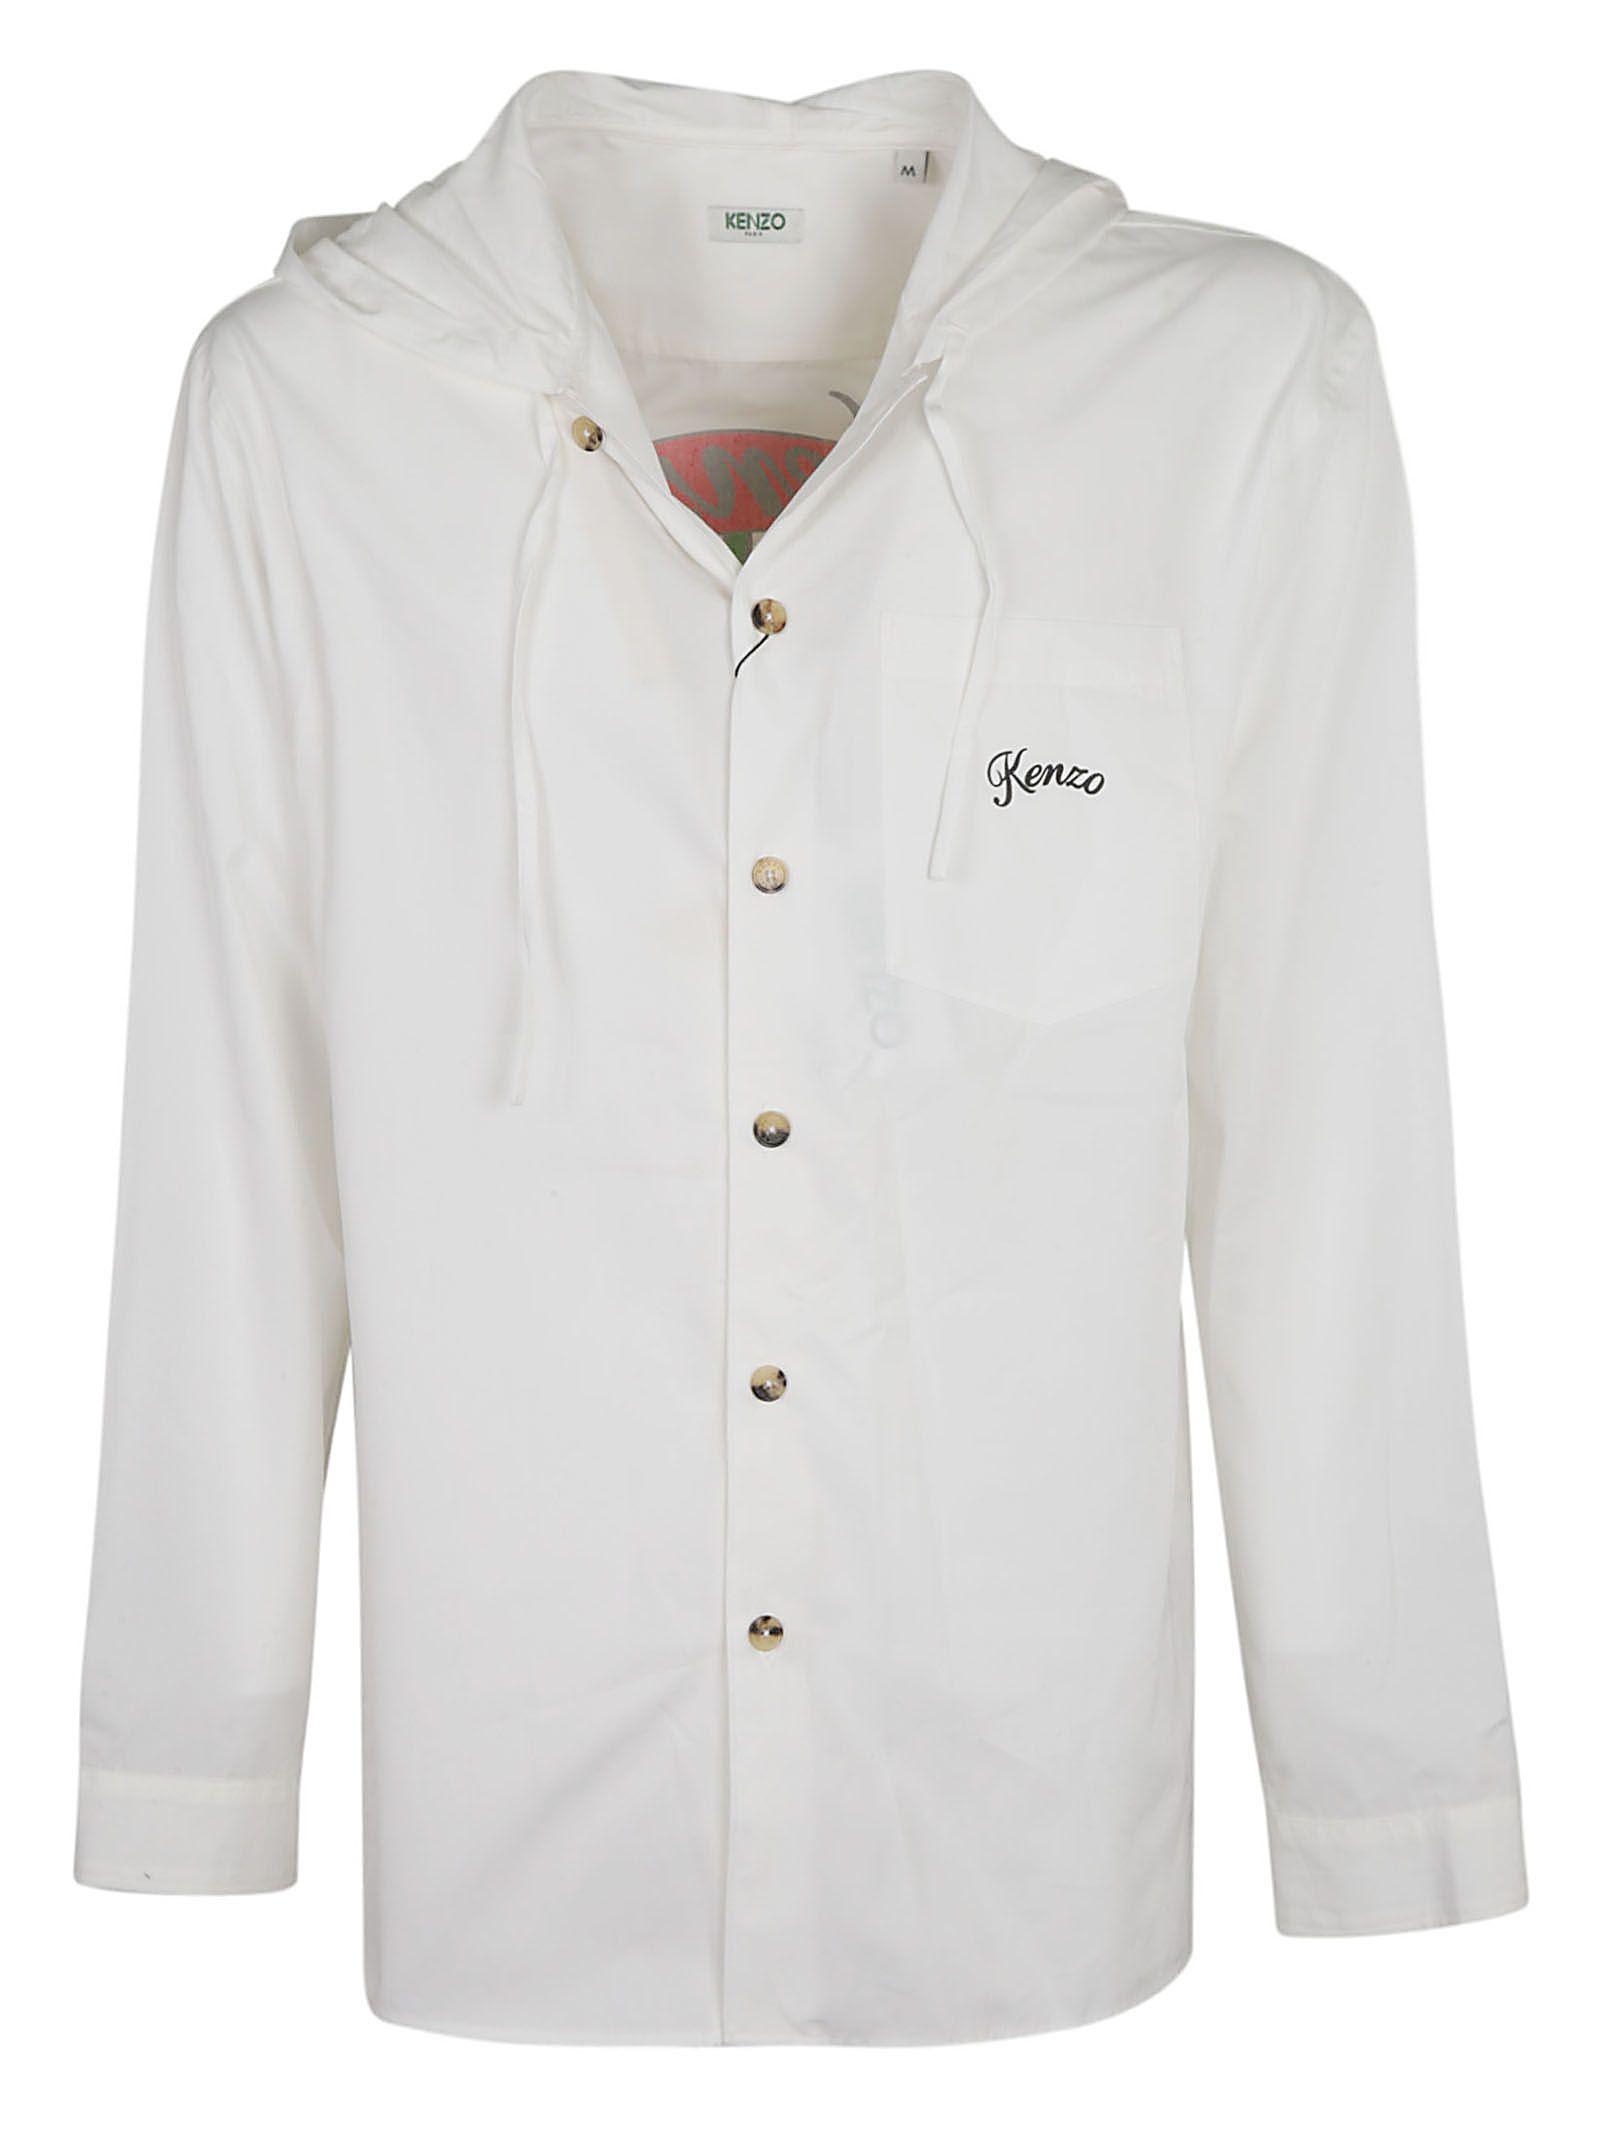 Kenzo Hooded Shirt